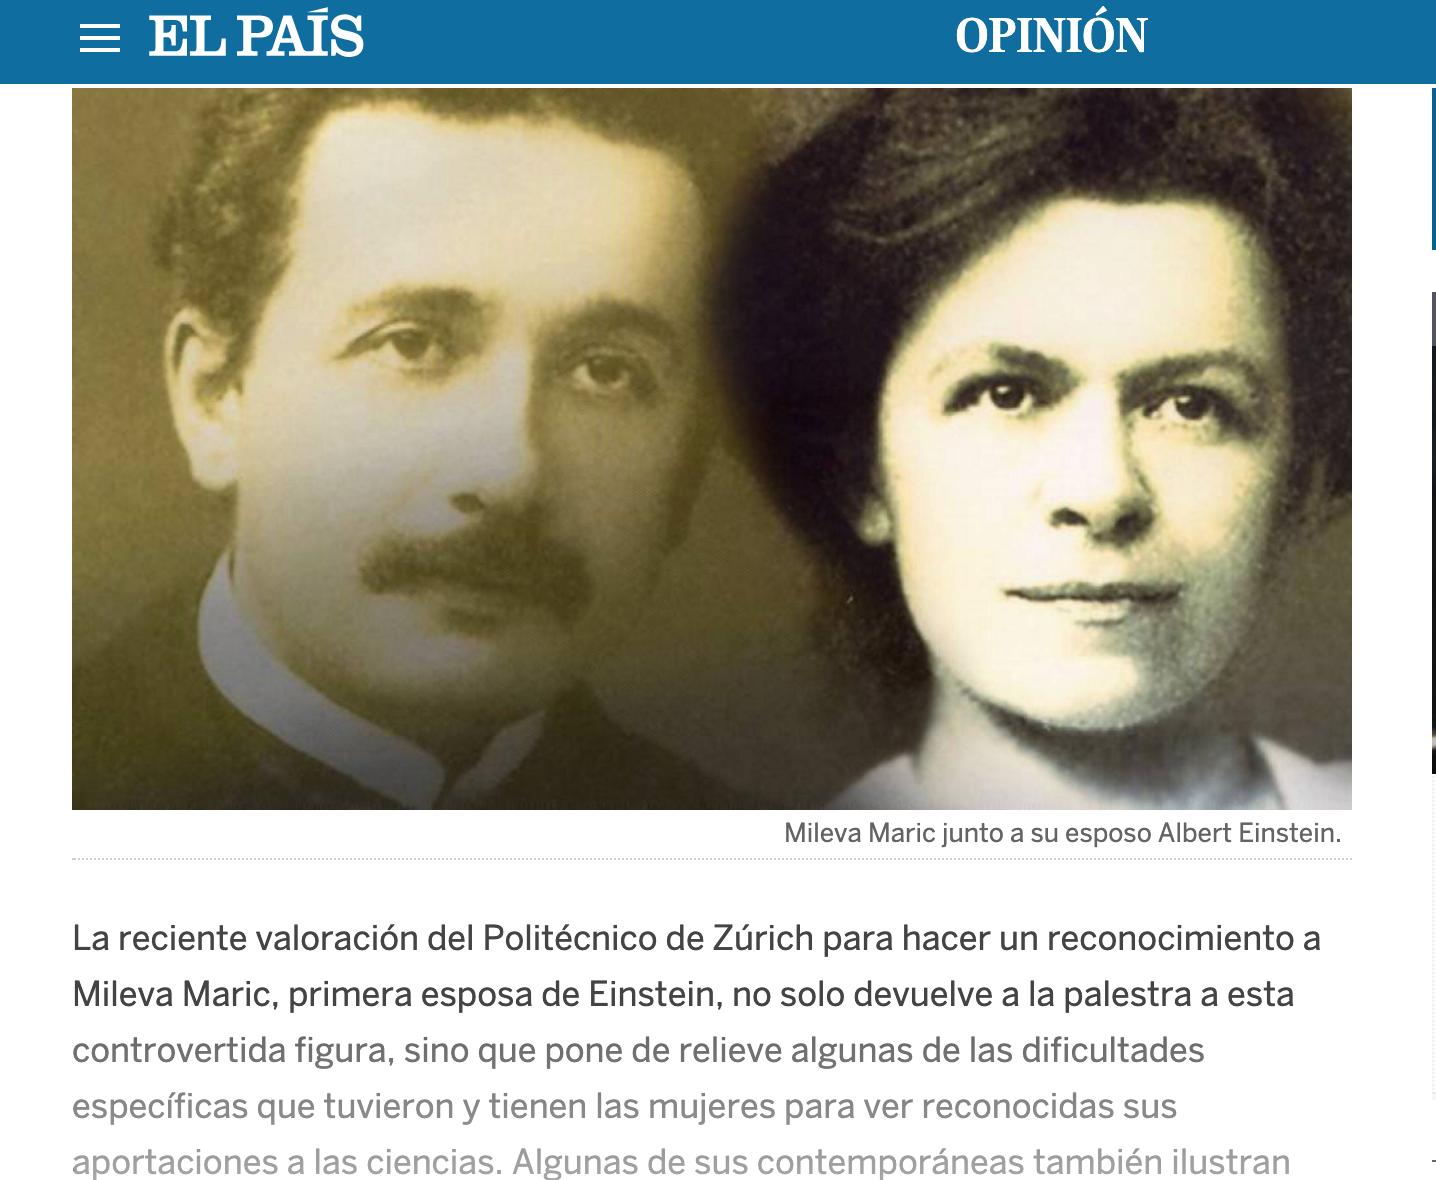 Anche su El Pais la mia proposta di attribuire una laurea postuma a Mileva Maric…